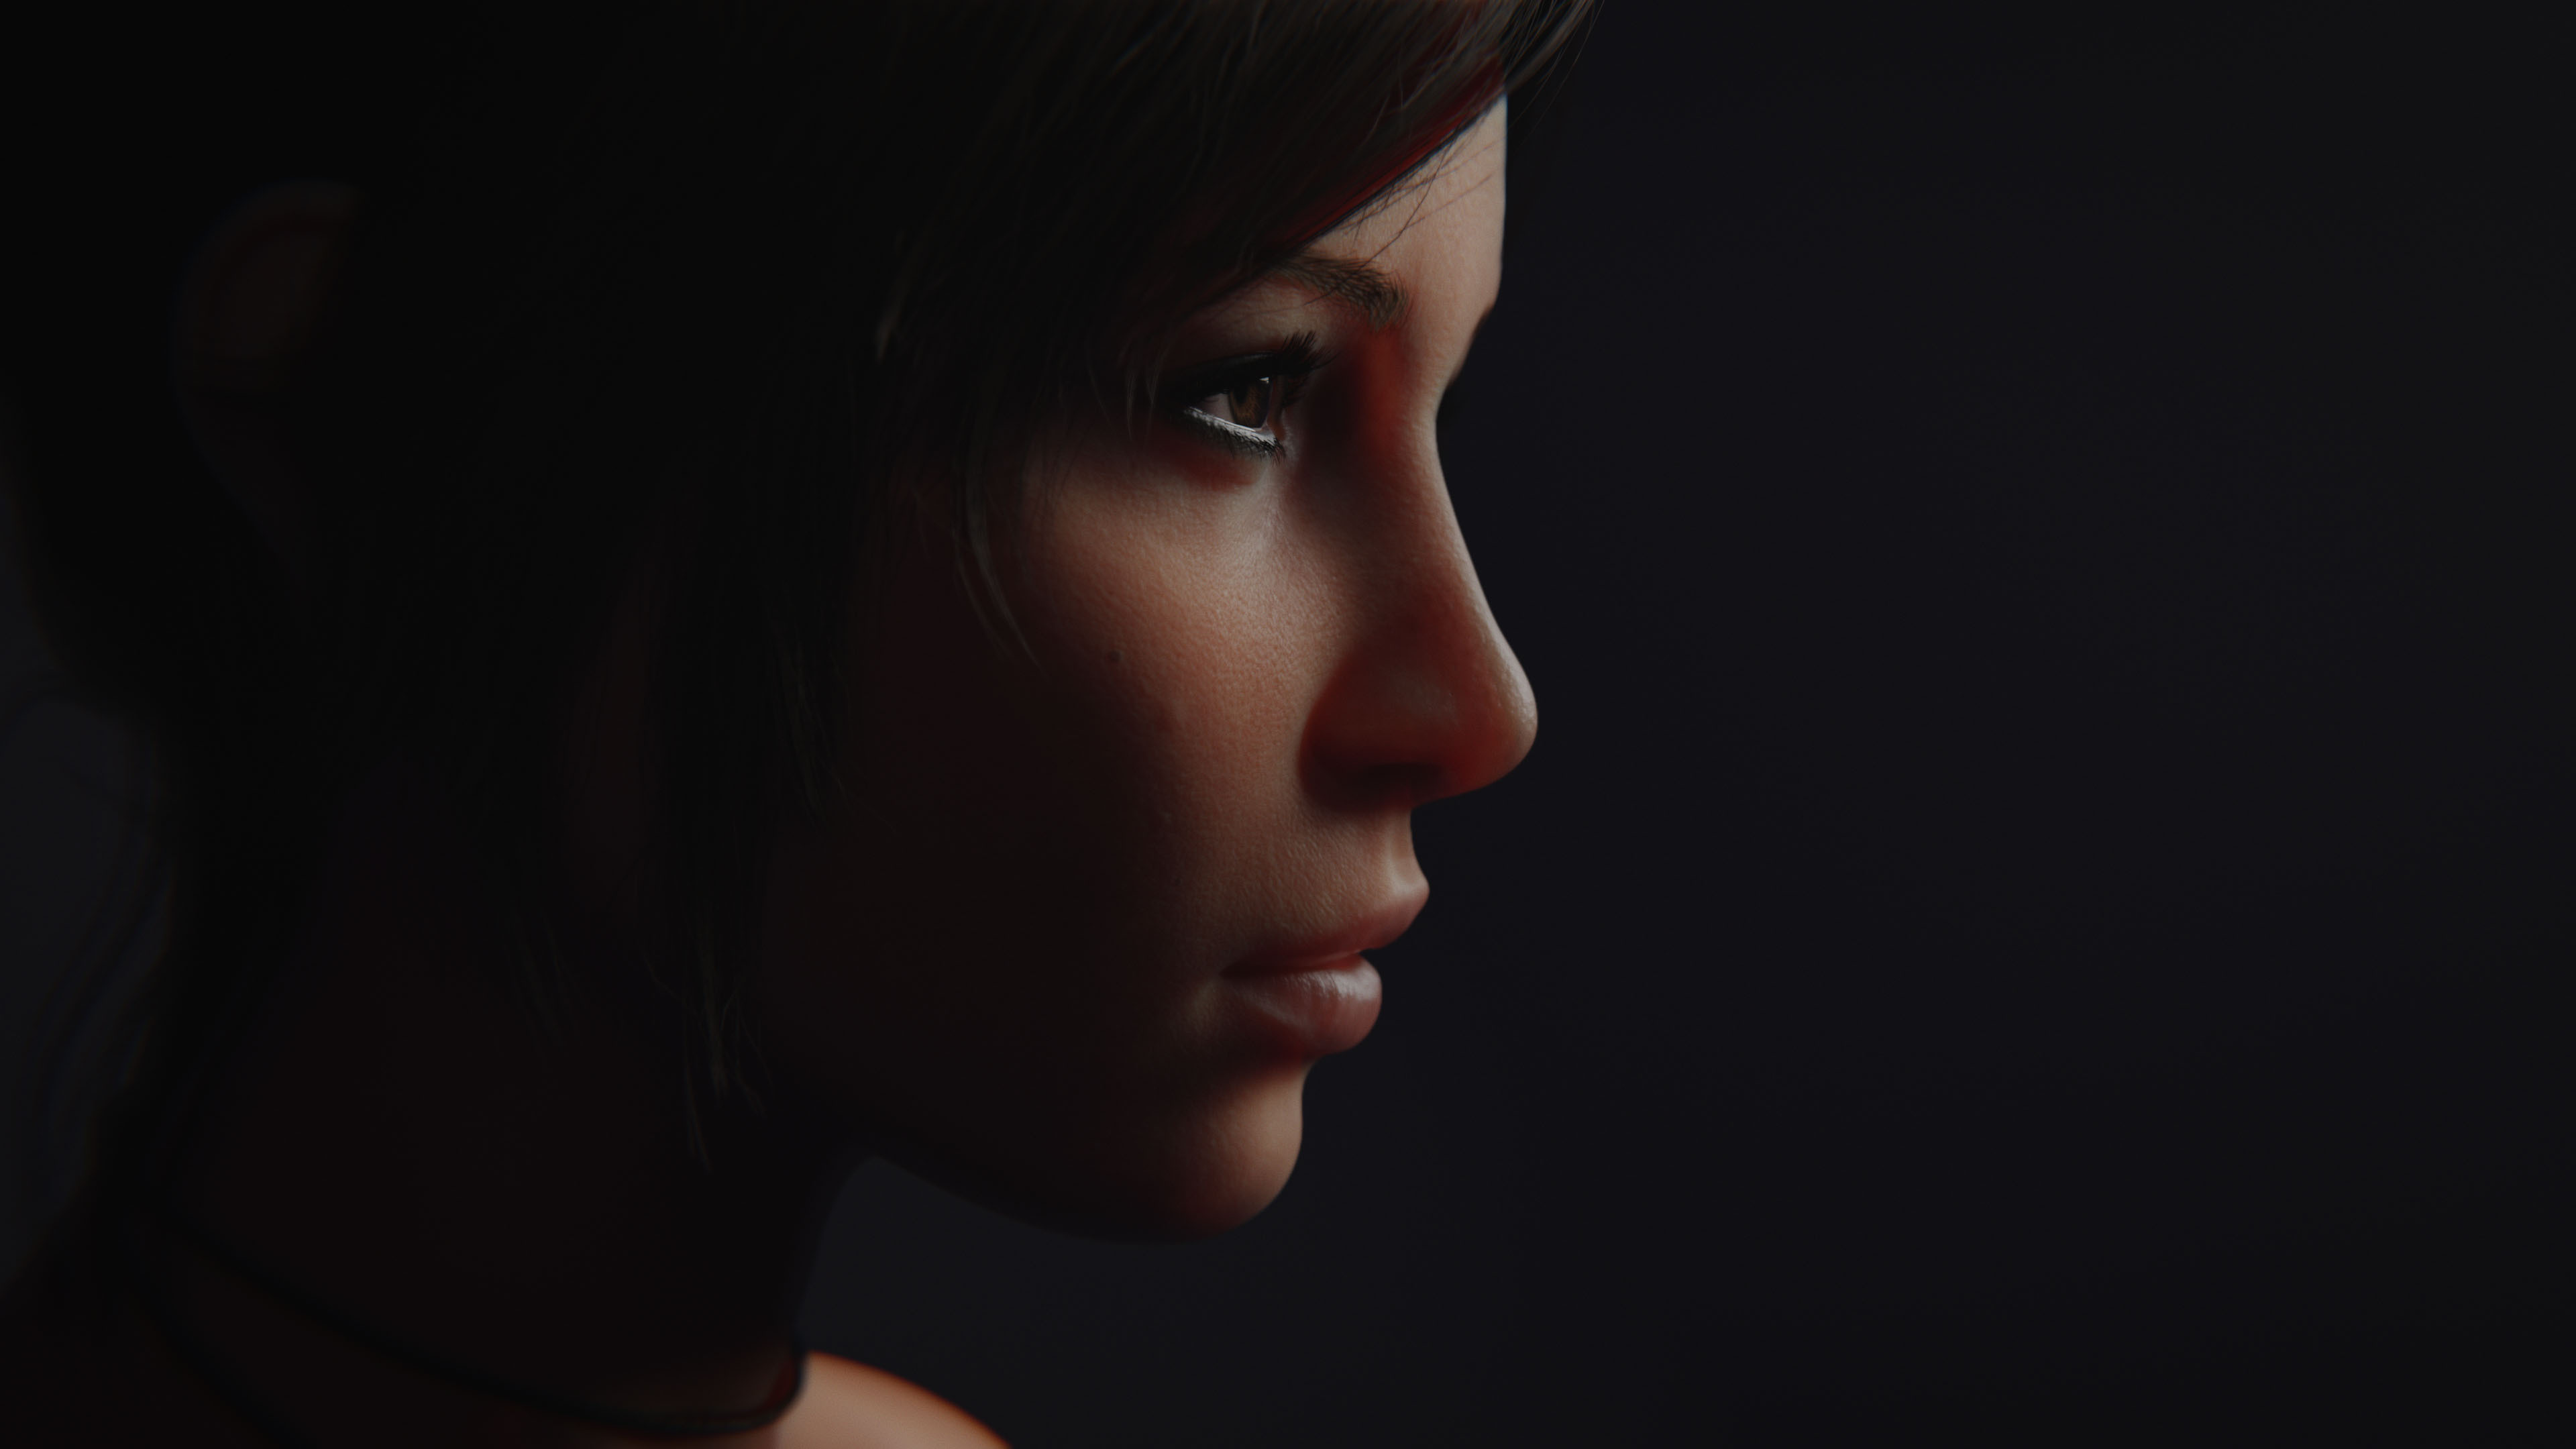 She is my Lara